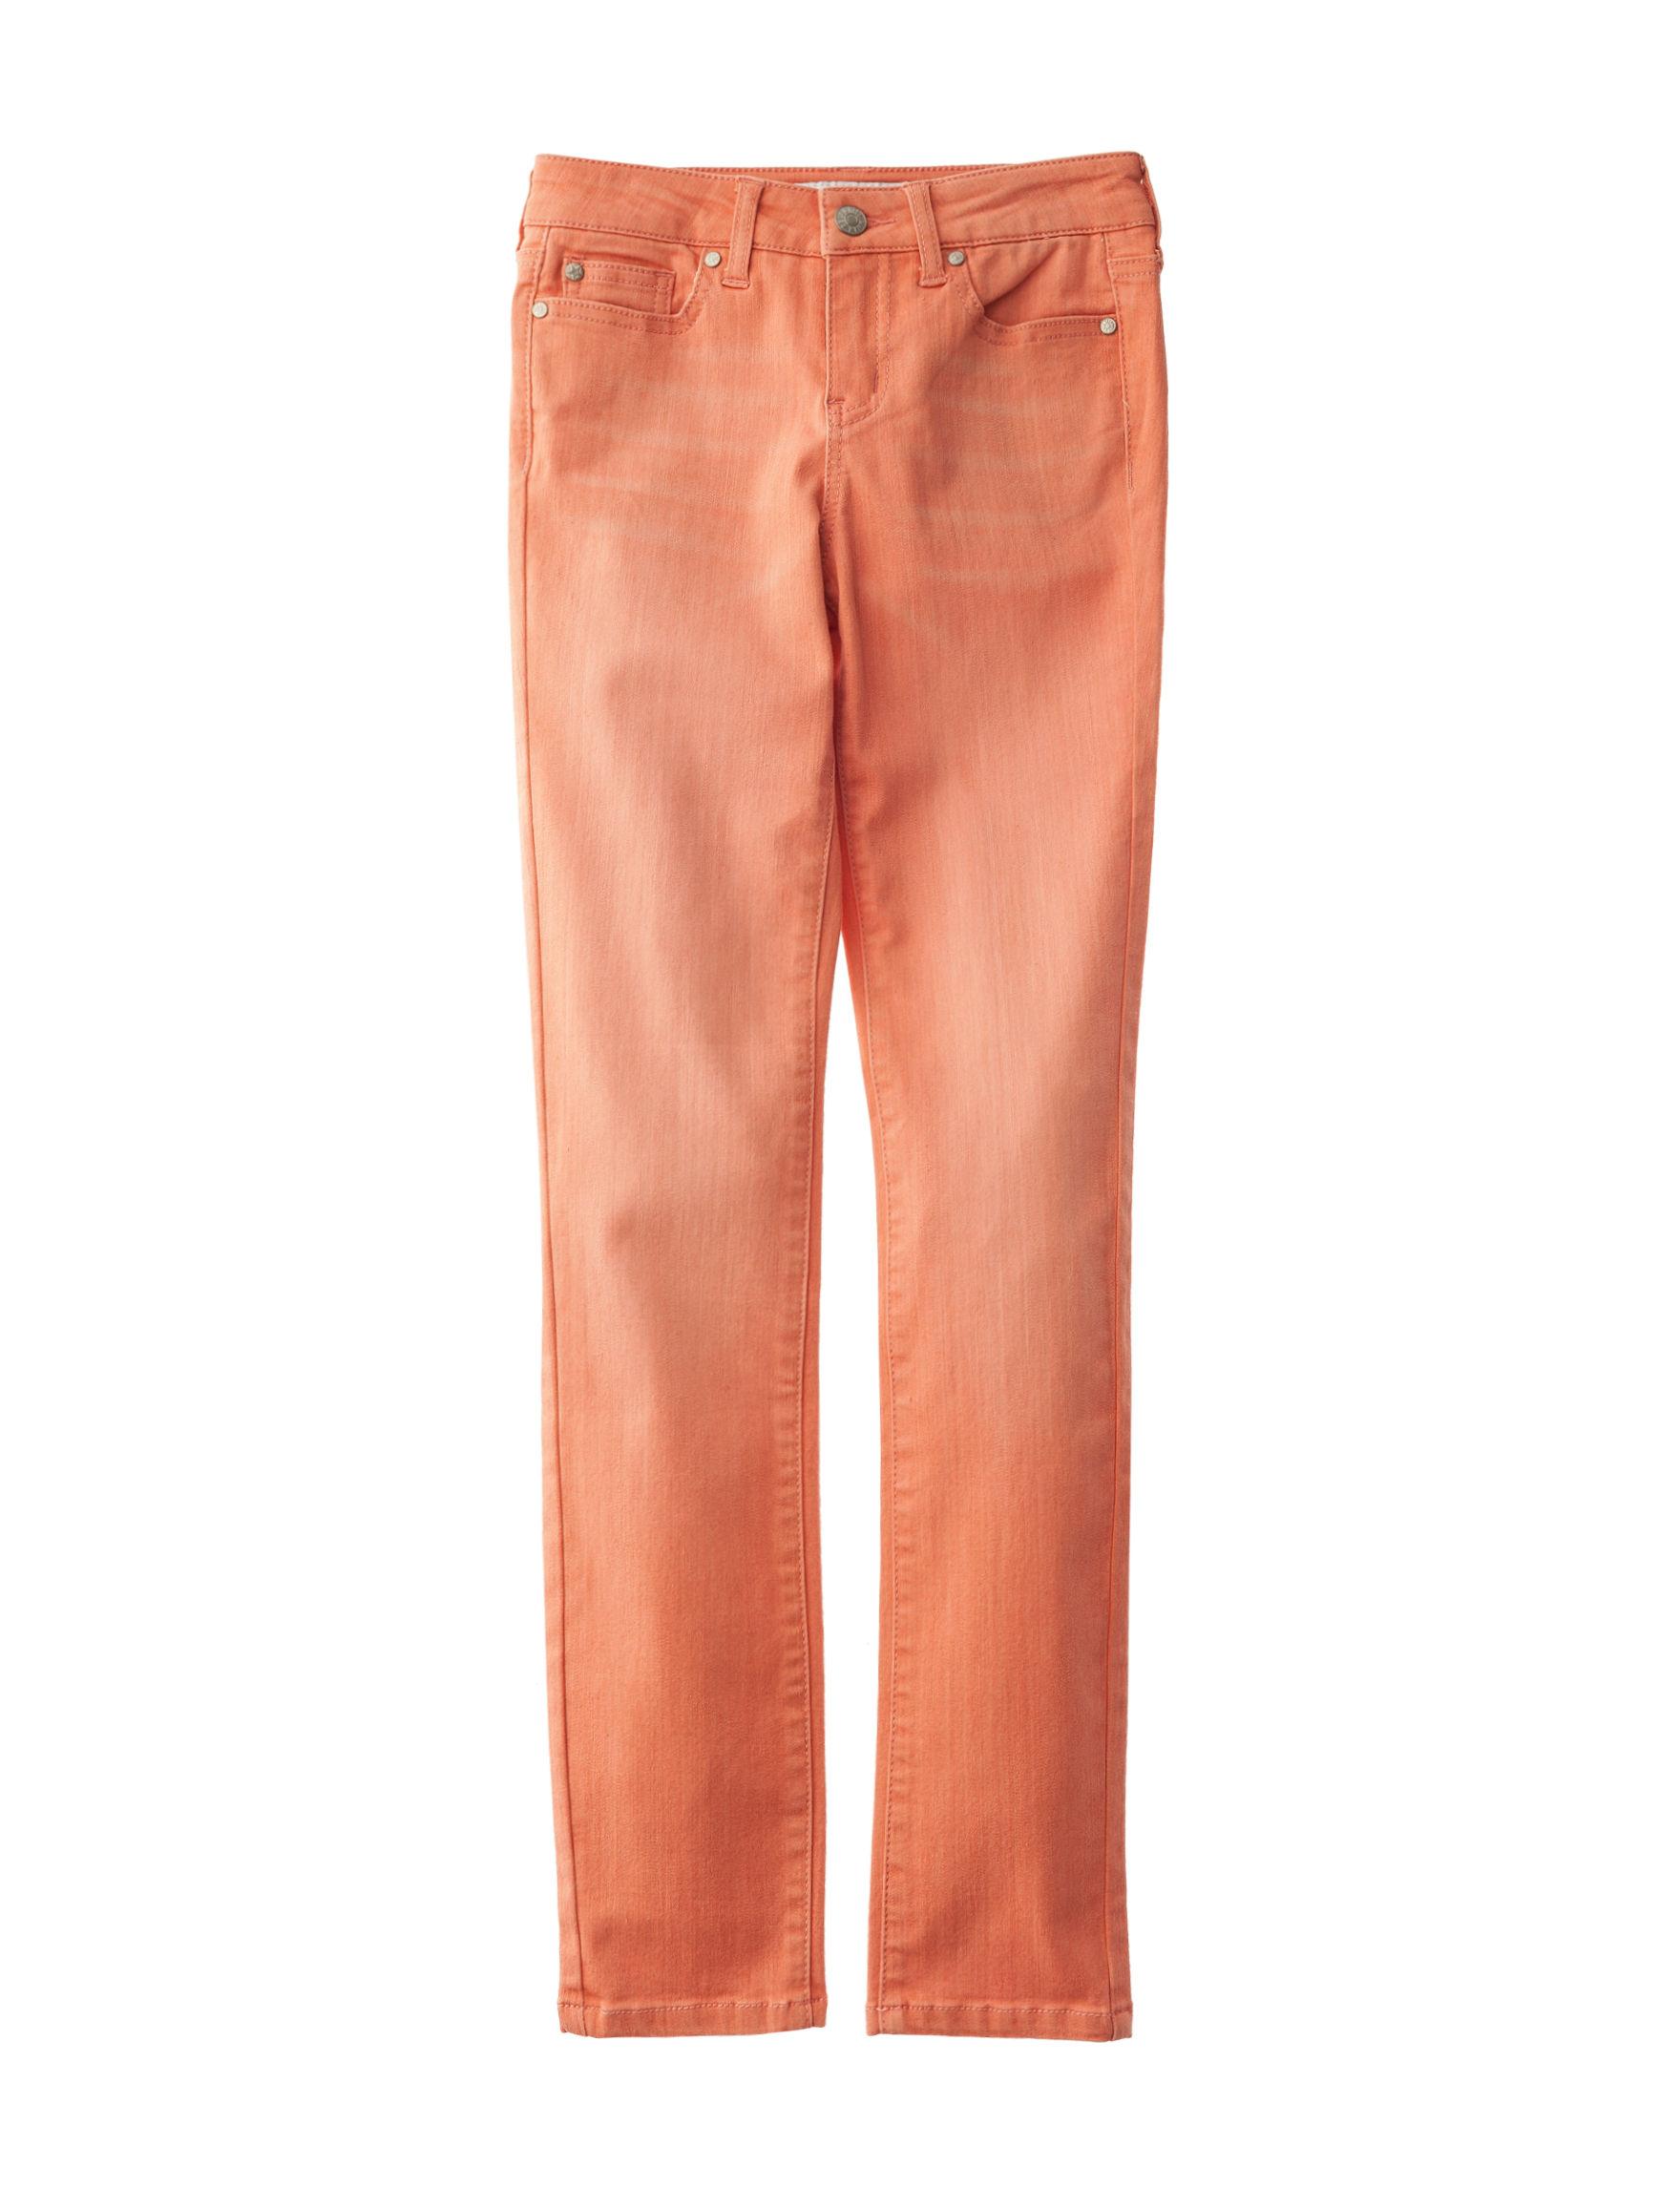 Celebrity Pink Peach Skinny